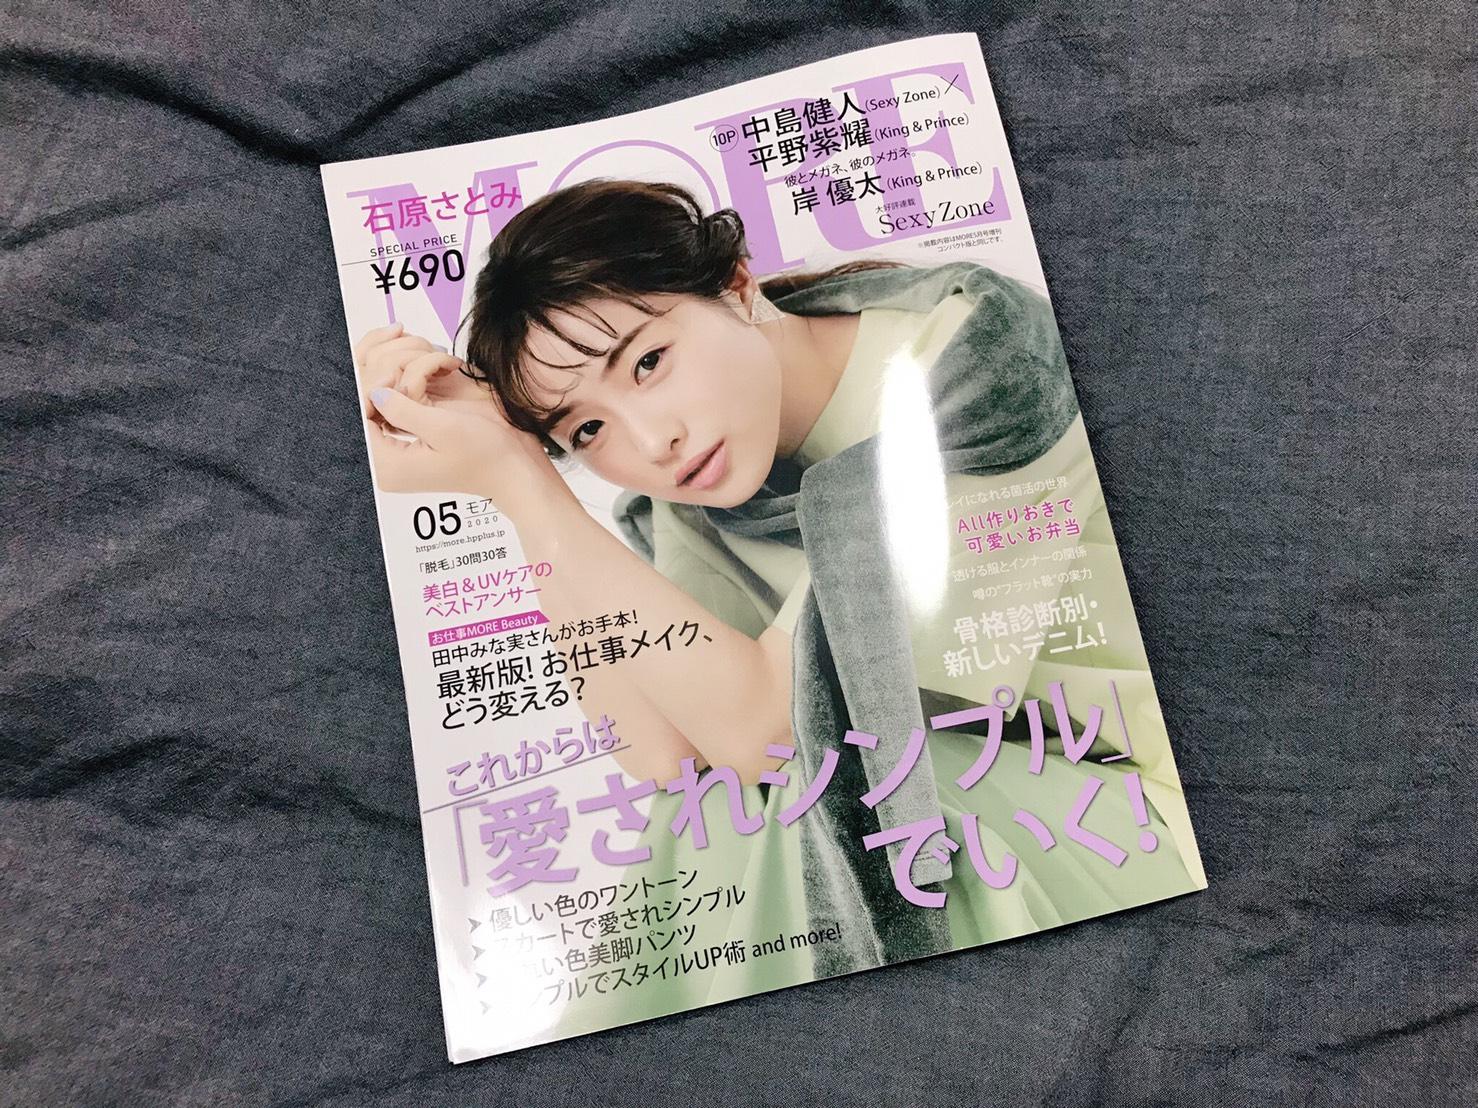 【MORE5月号】お仕事メイク特集!メイクアップアーティスト❁小田切ヒロさん❁直伝!眉メイクの教え。_2